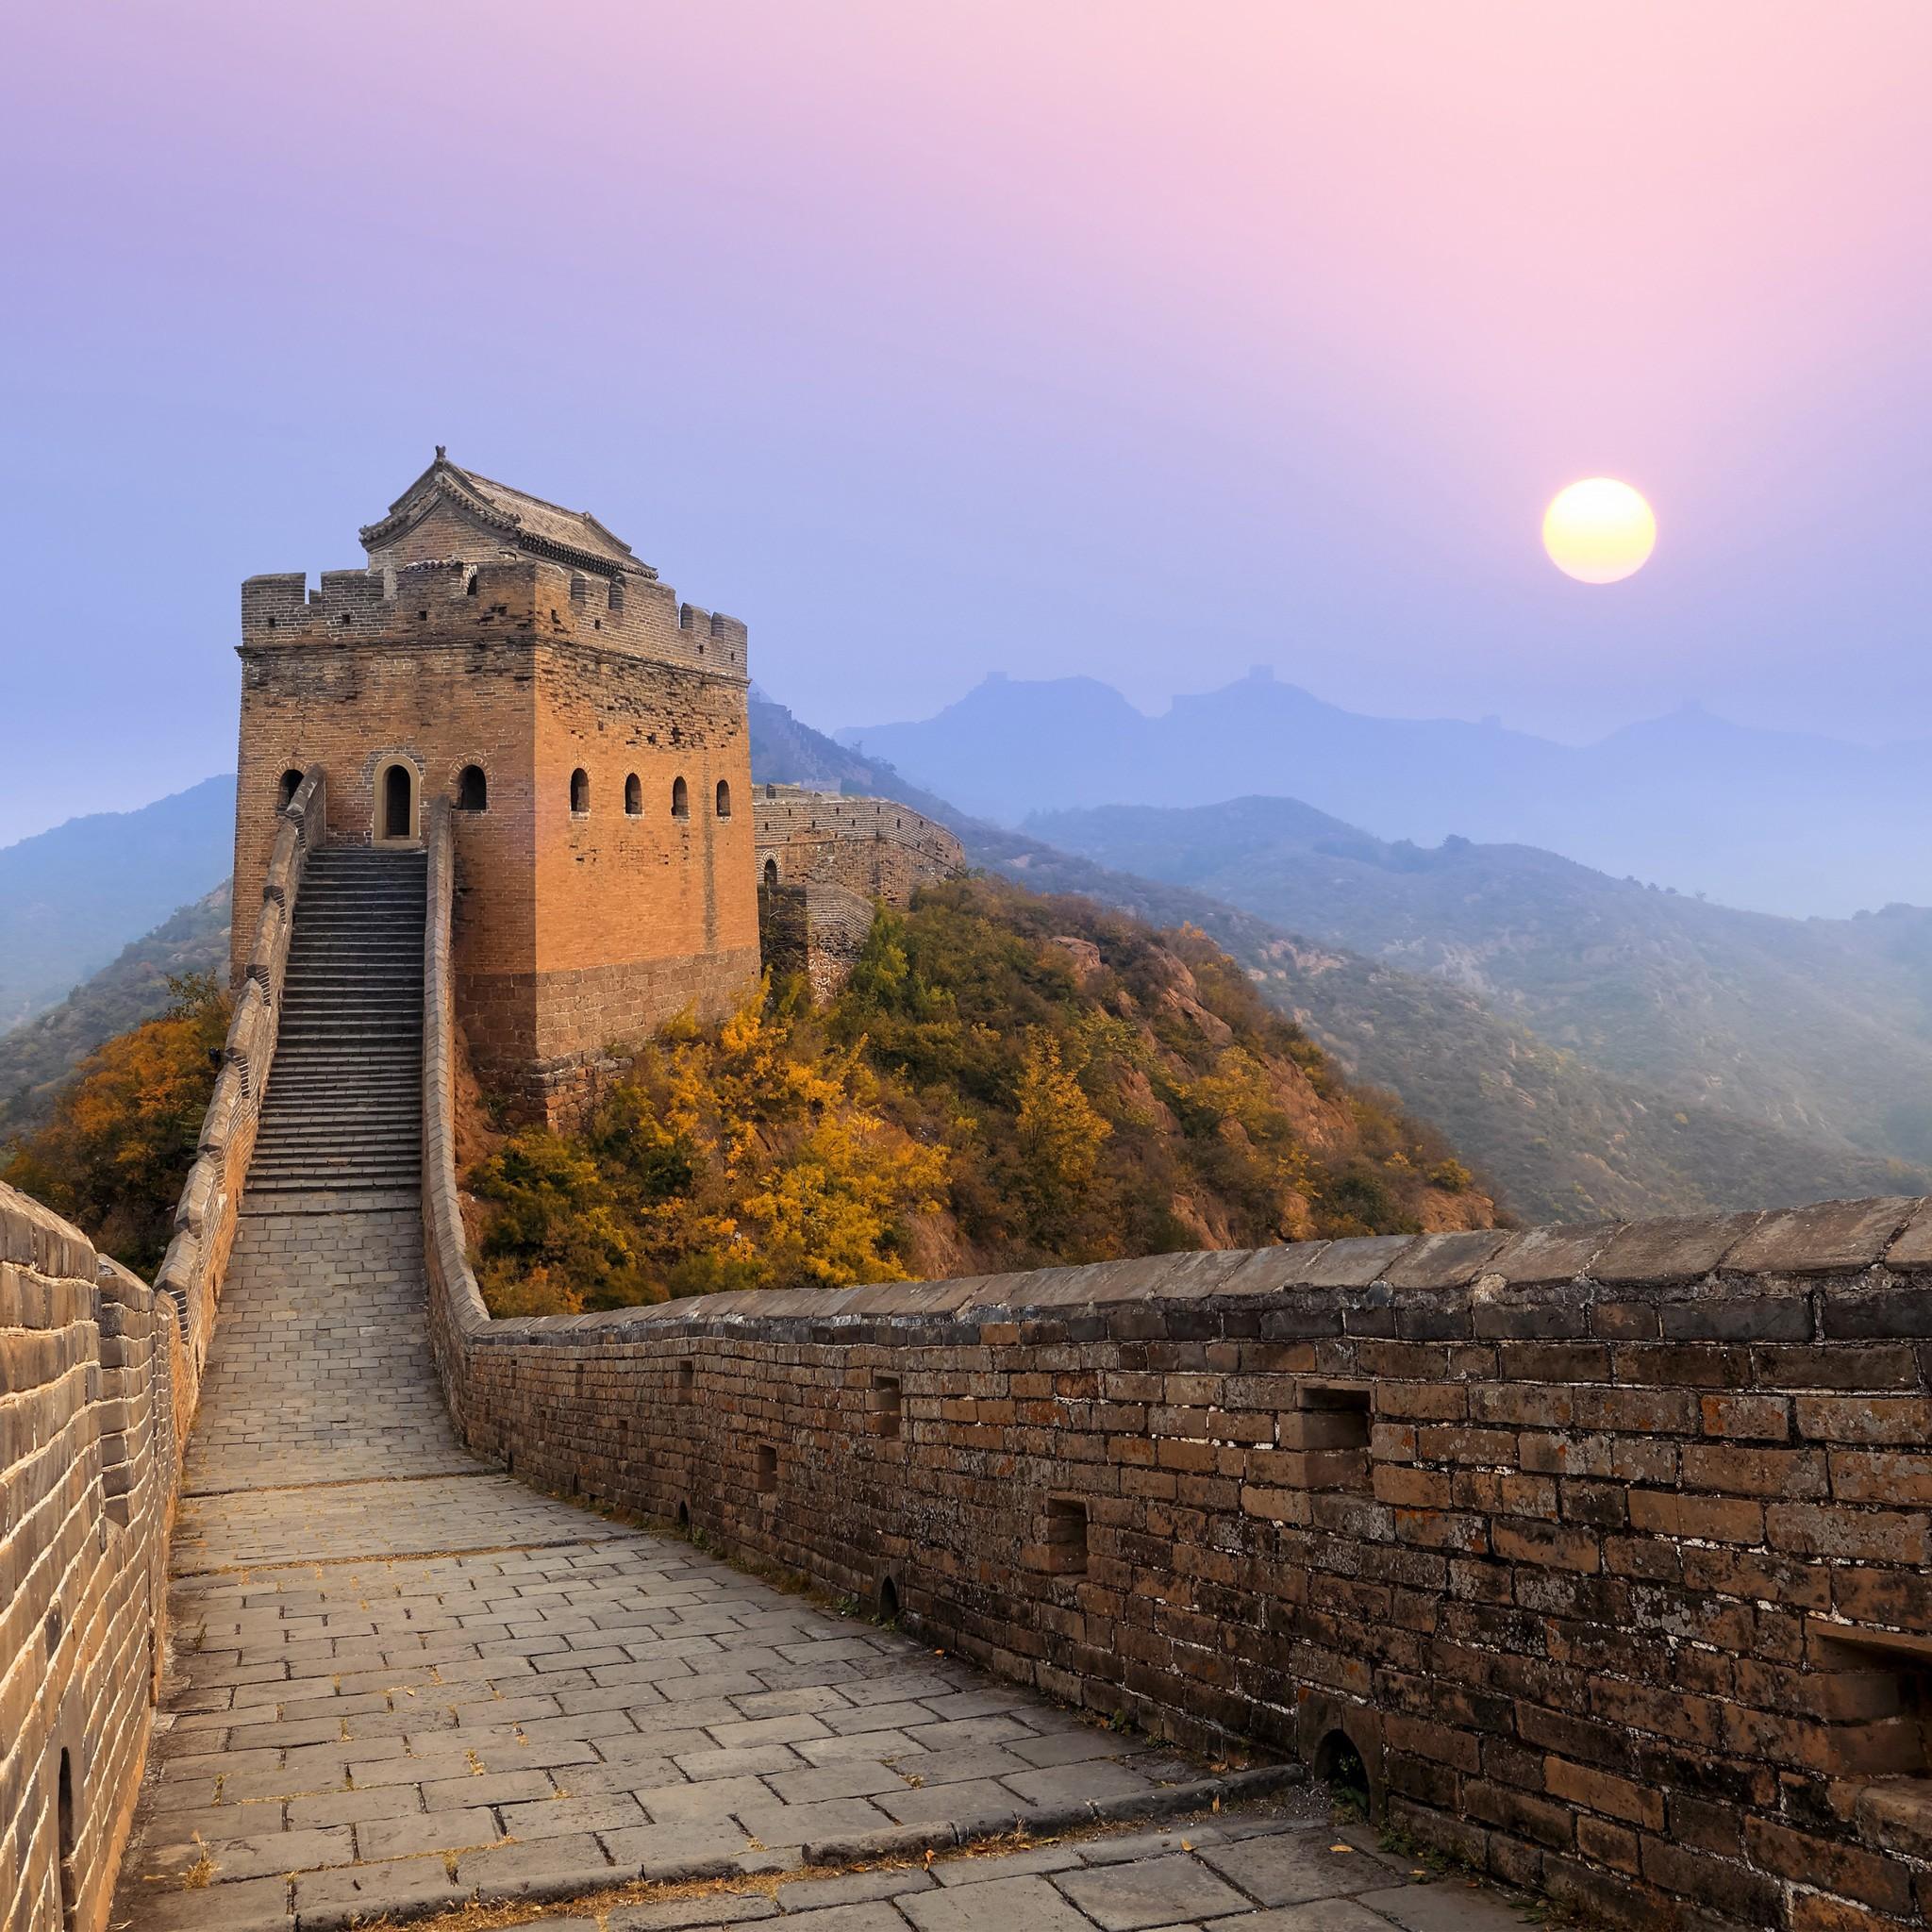 China Wallpaper Full Hd Great Wall Of China Sunrise Wallpapers Hd Wallpapers